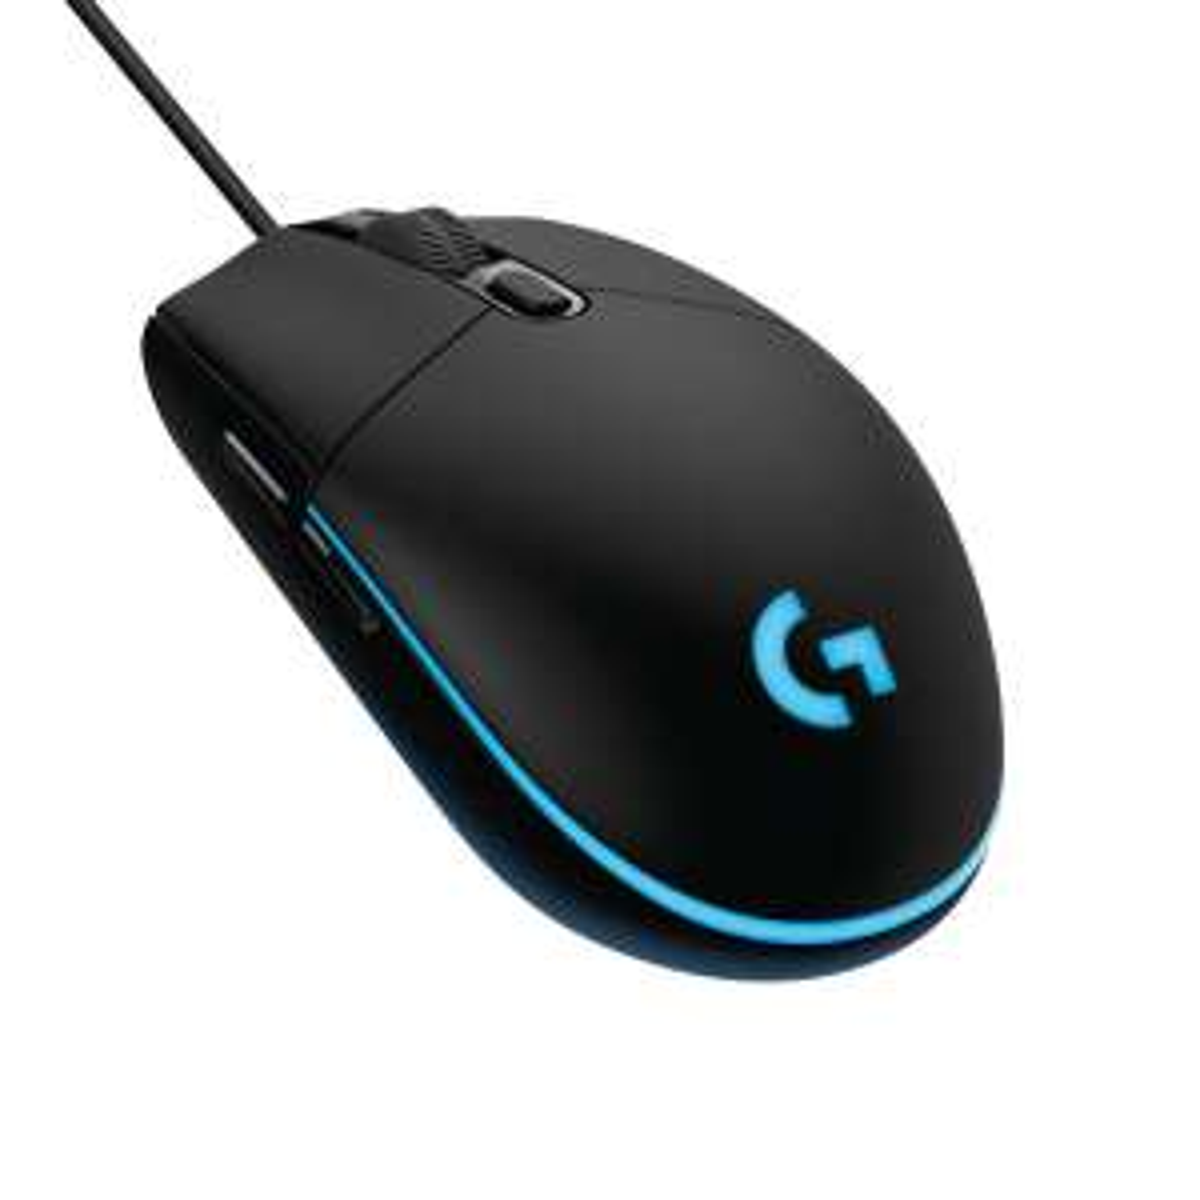 Logitech G203 Prodigy RGB Gaming Mouse (Amazon Warehouse like new) £16.12